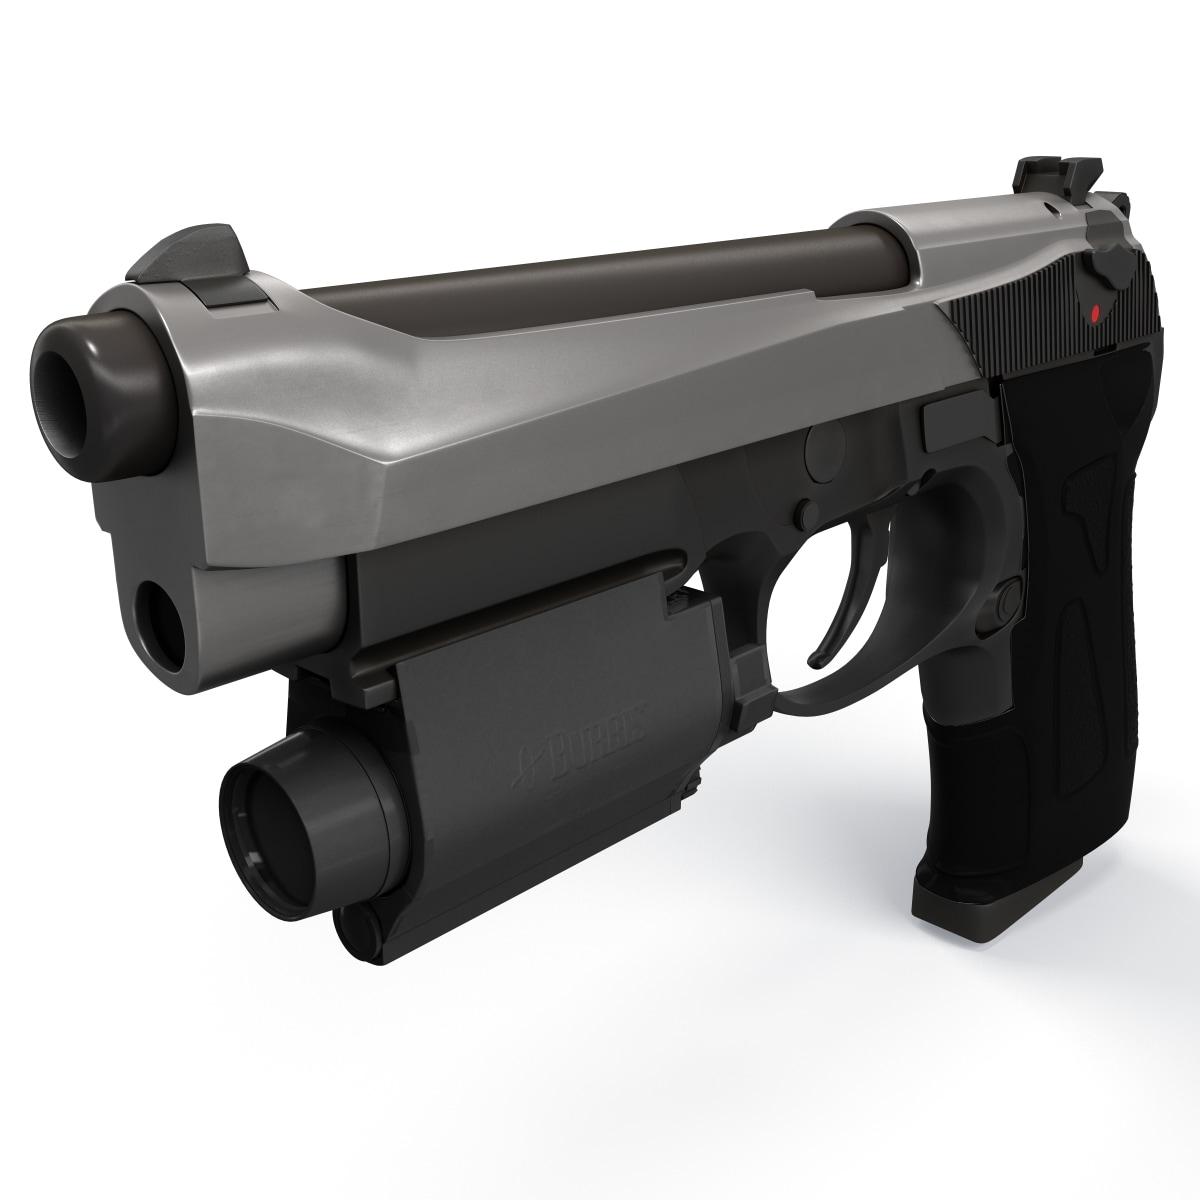 Photoreal Beretta Handgun